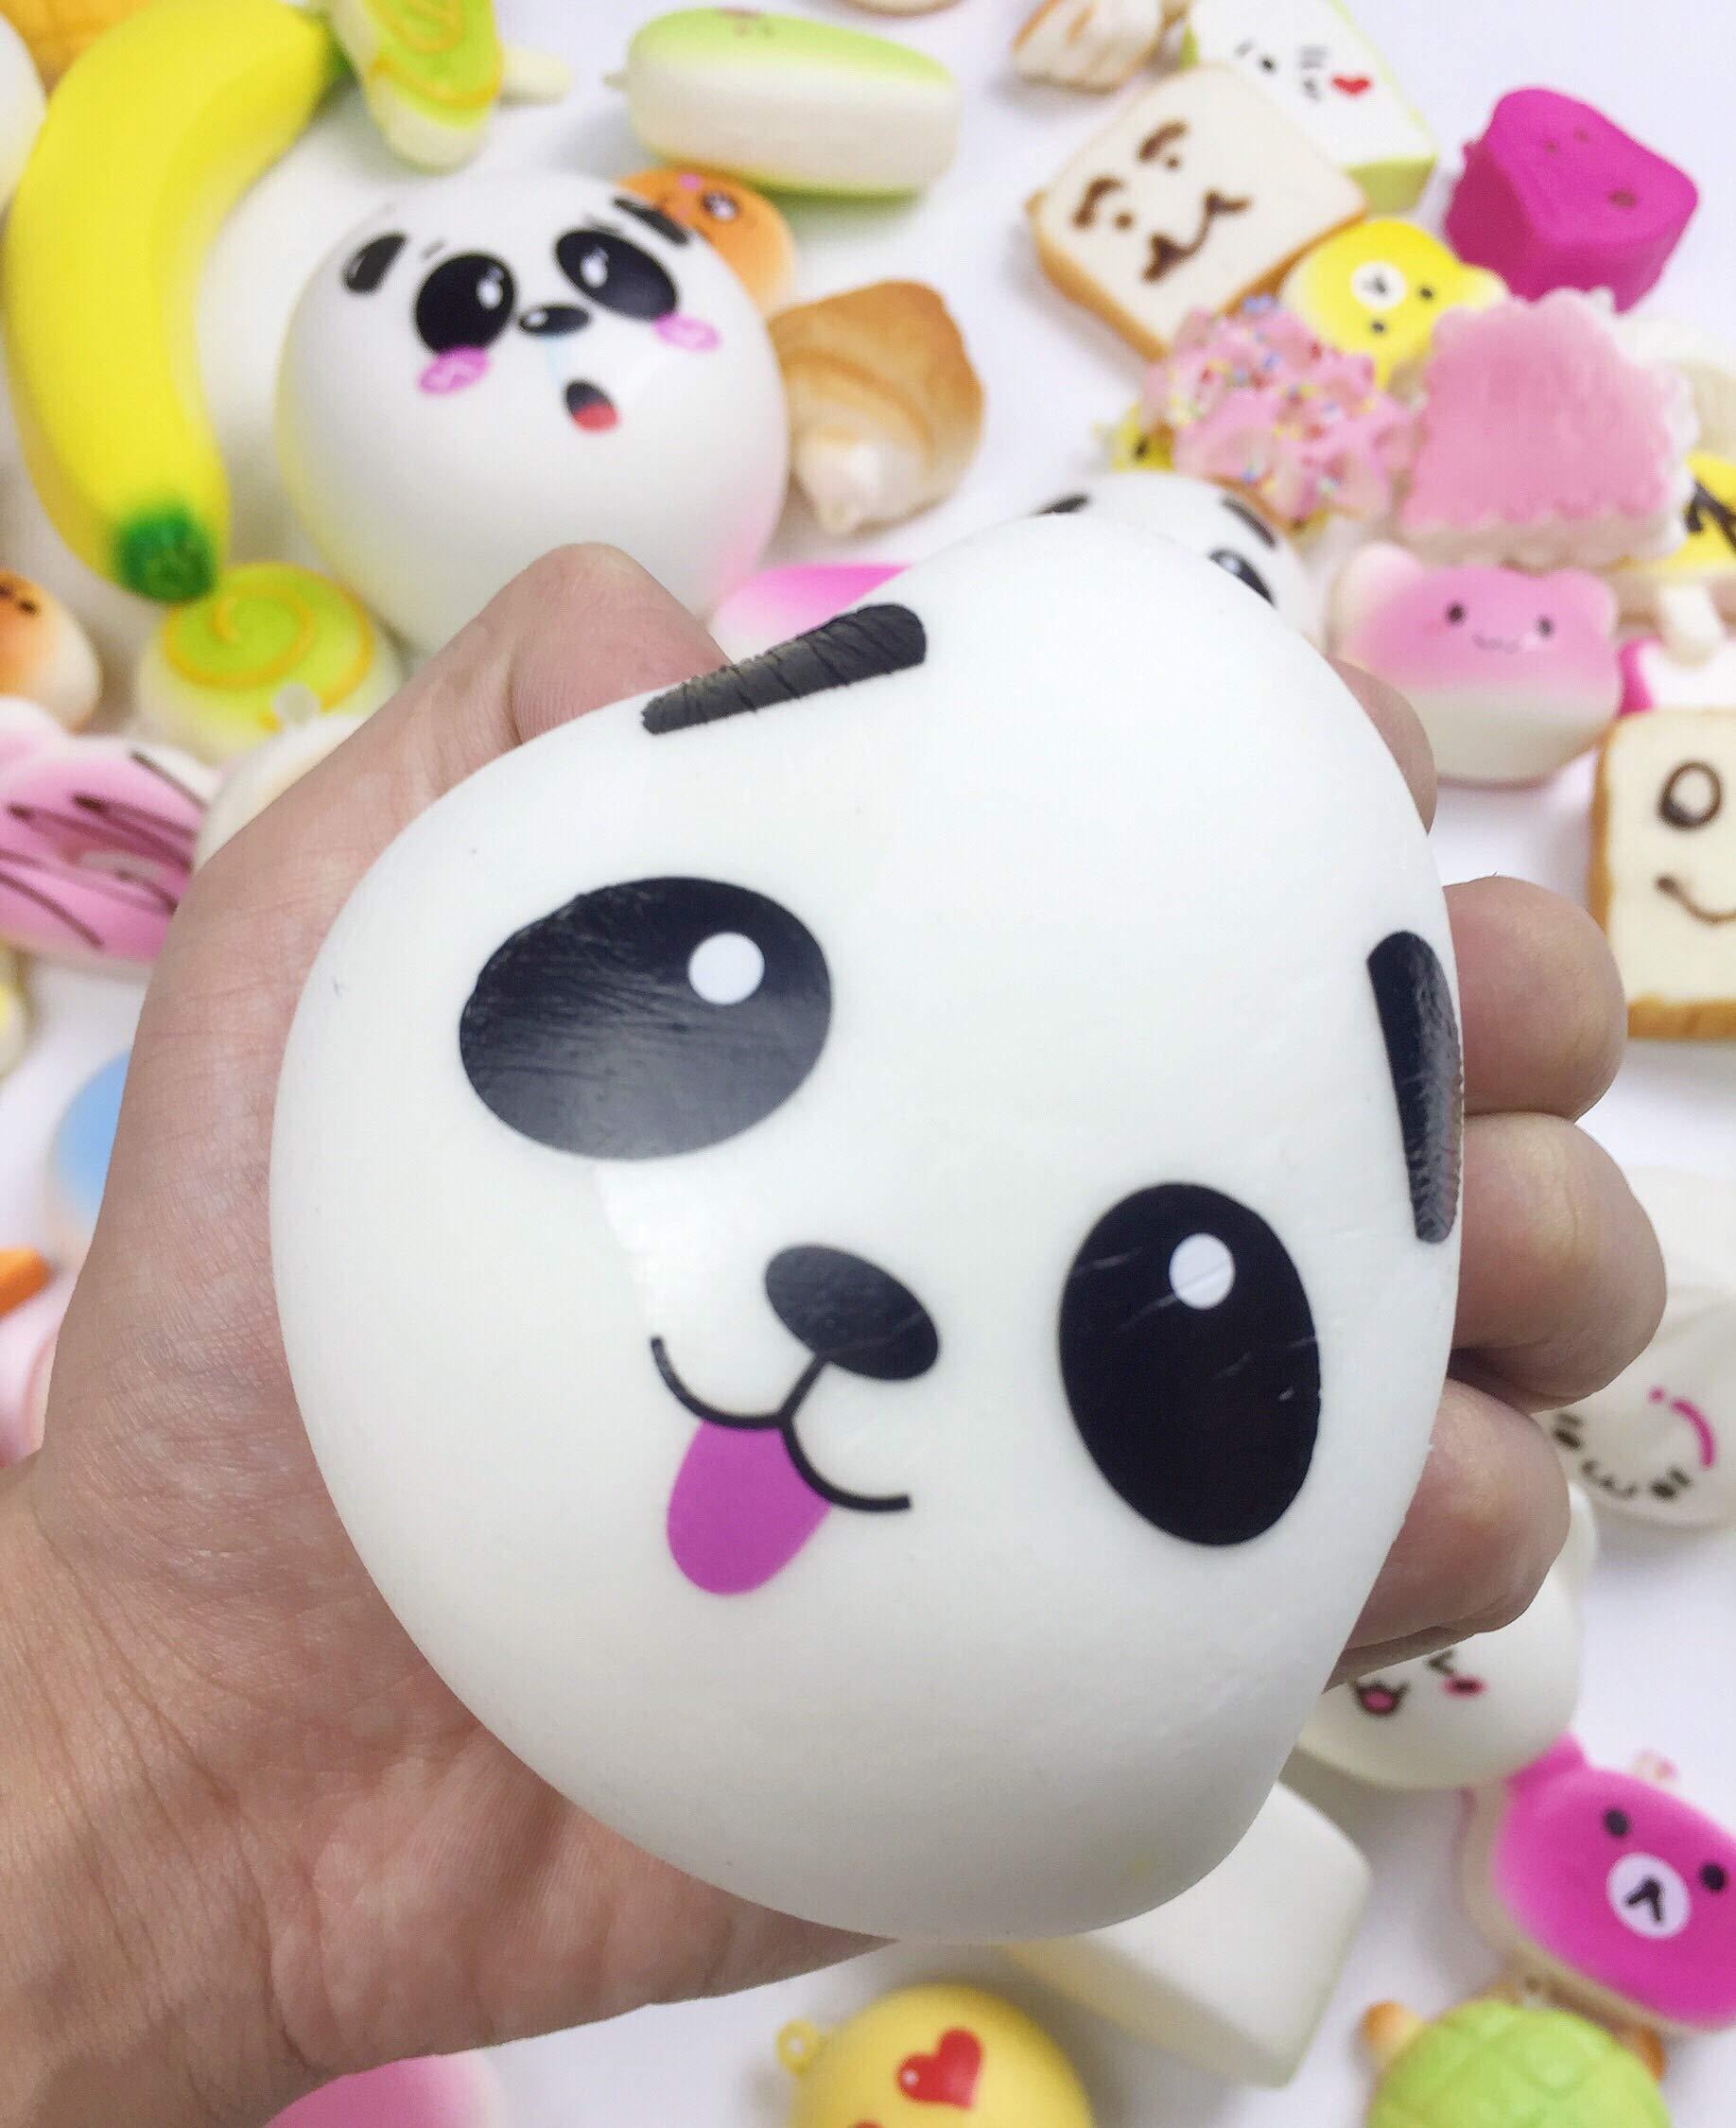 50 Pcs Kawaii Squishies Slow Rising Jumbo/Medium/Mini Random Cake Bread Panda Bun with Phone Straps Kids Pretend Play ibloom squishy